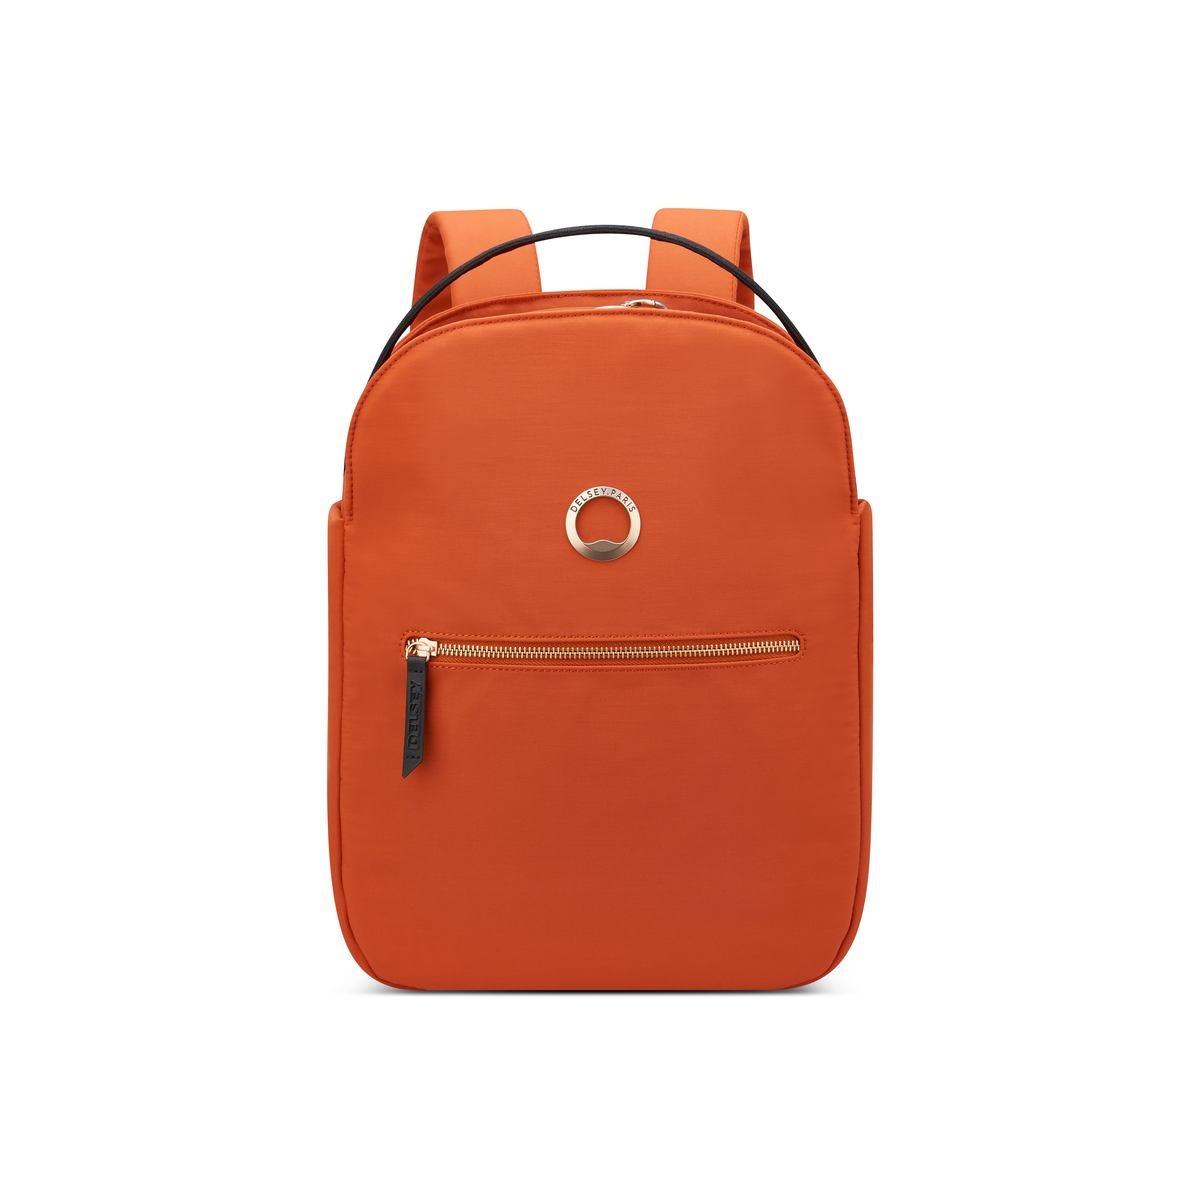 Delsey Σακίδιο πλάτης με θέση PC 14  38x30x10,5cm σειρά Securstyle Orange